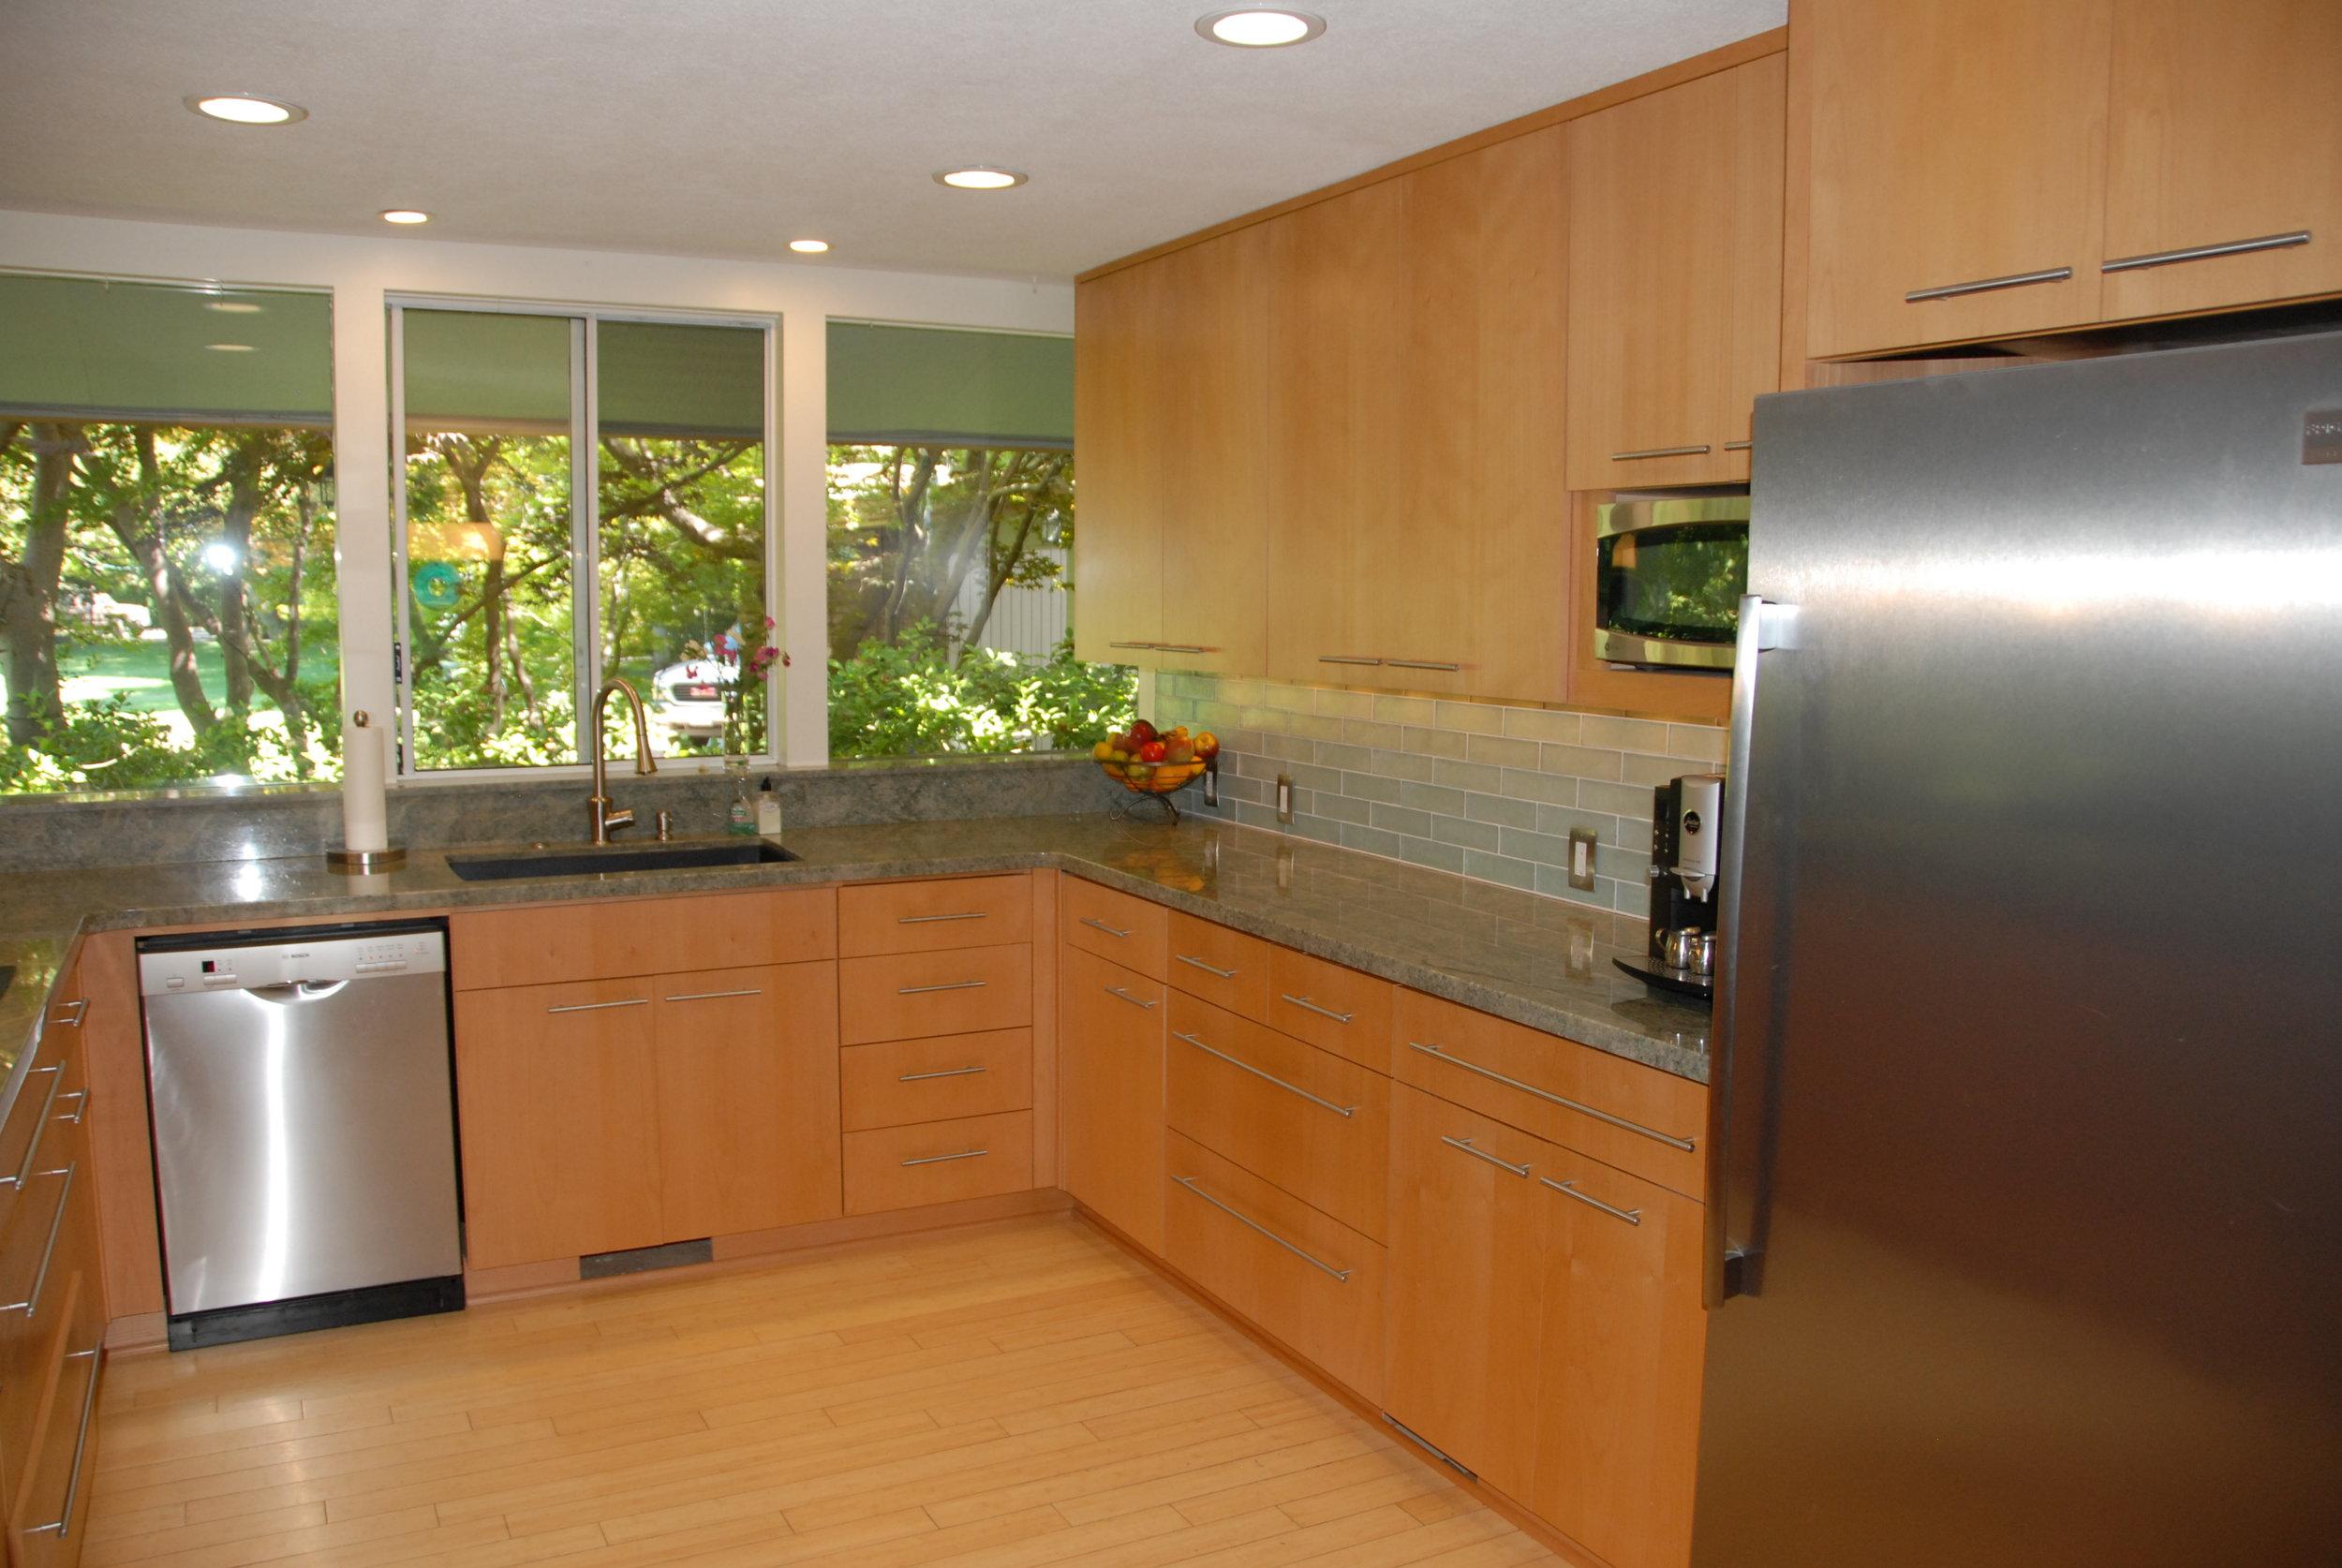 MId Century Modern Style Kitchen Remodel